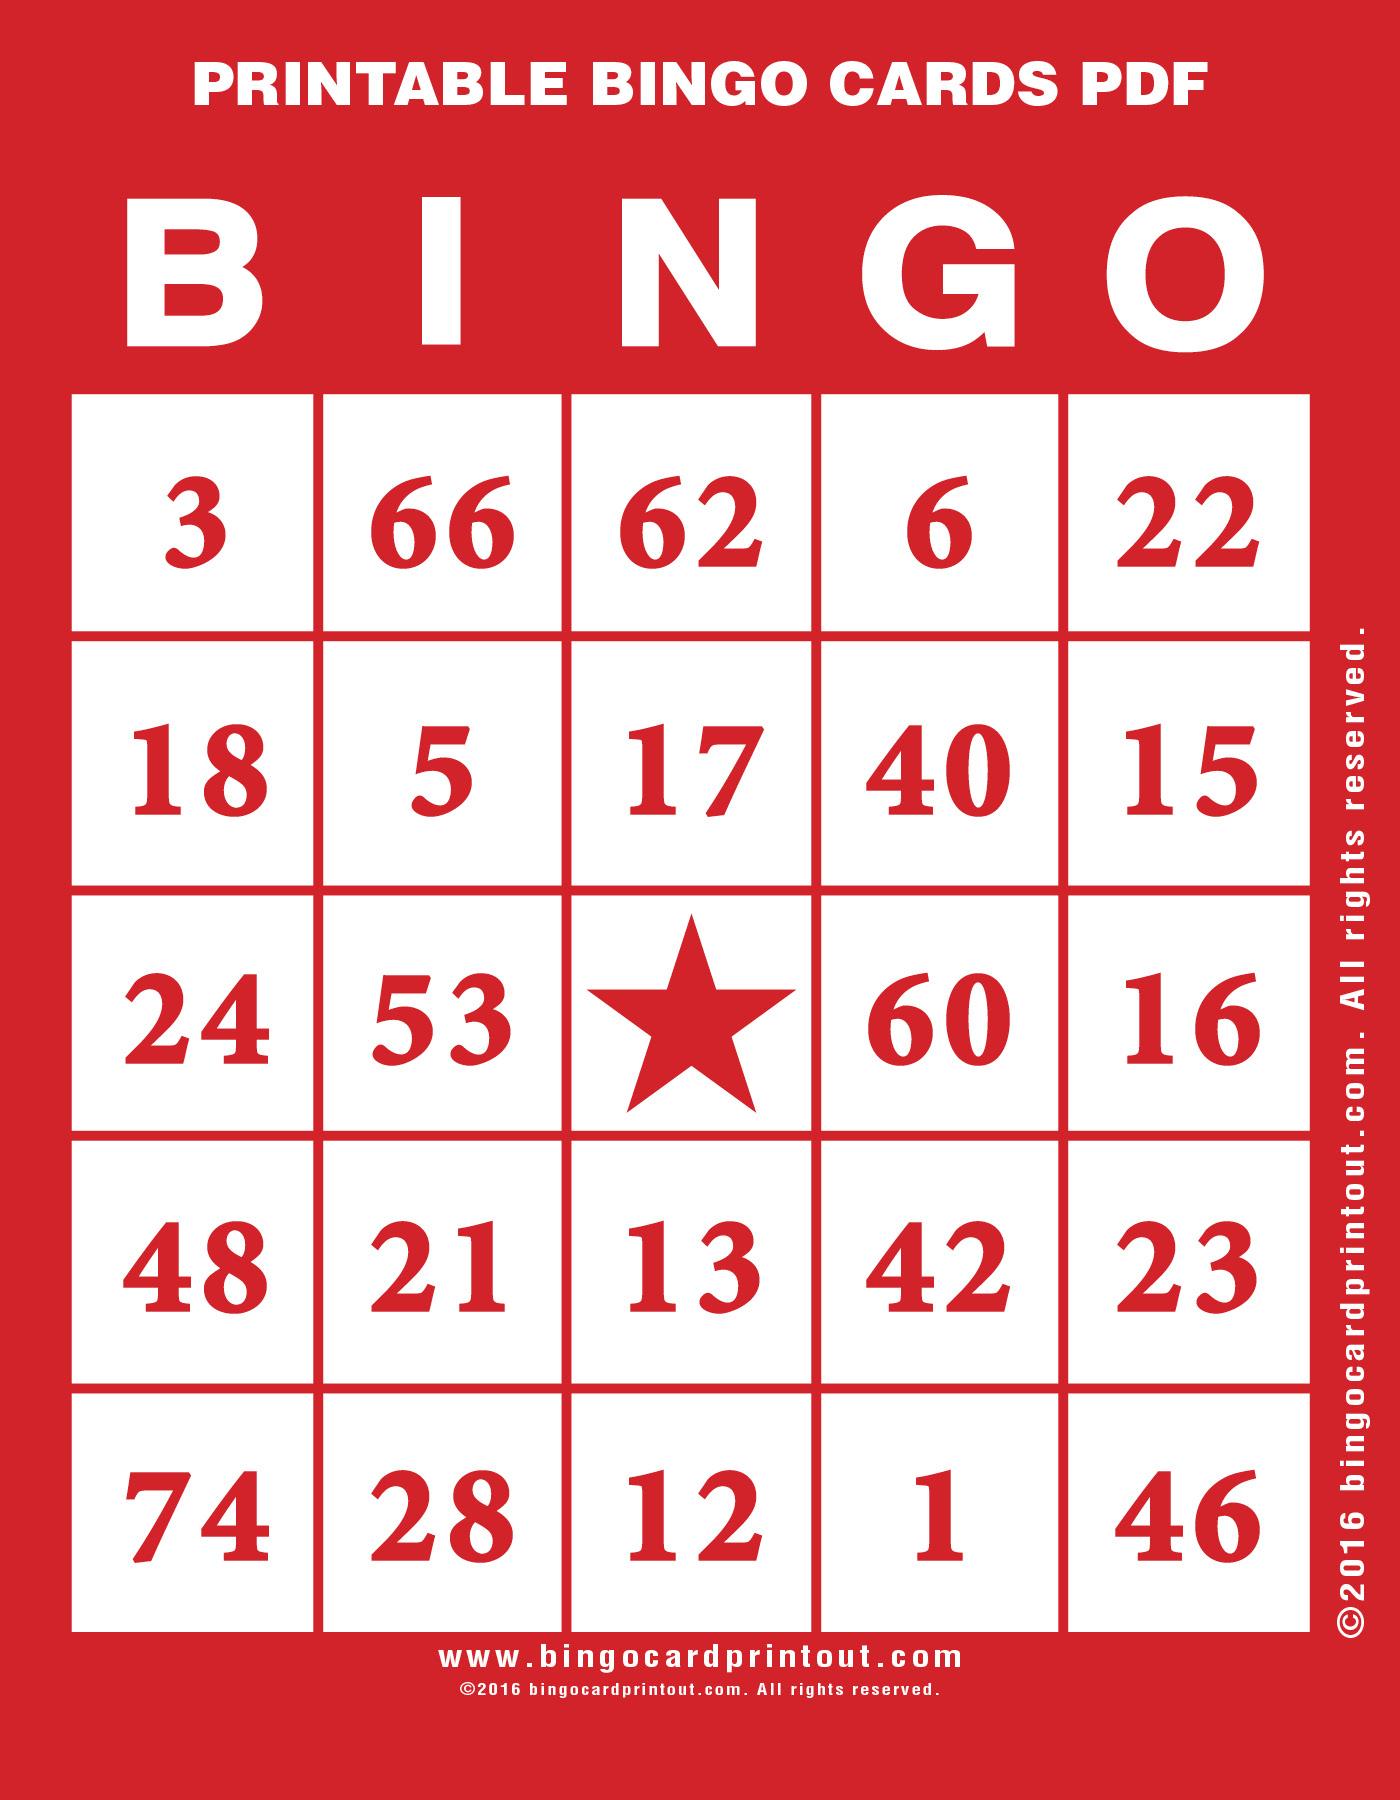 Printable Bingo Cards Pdf - Bingocardprintout